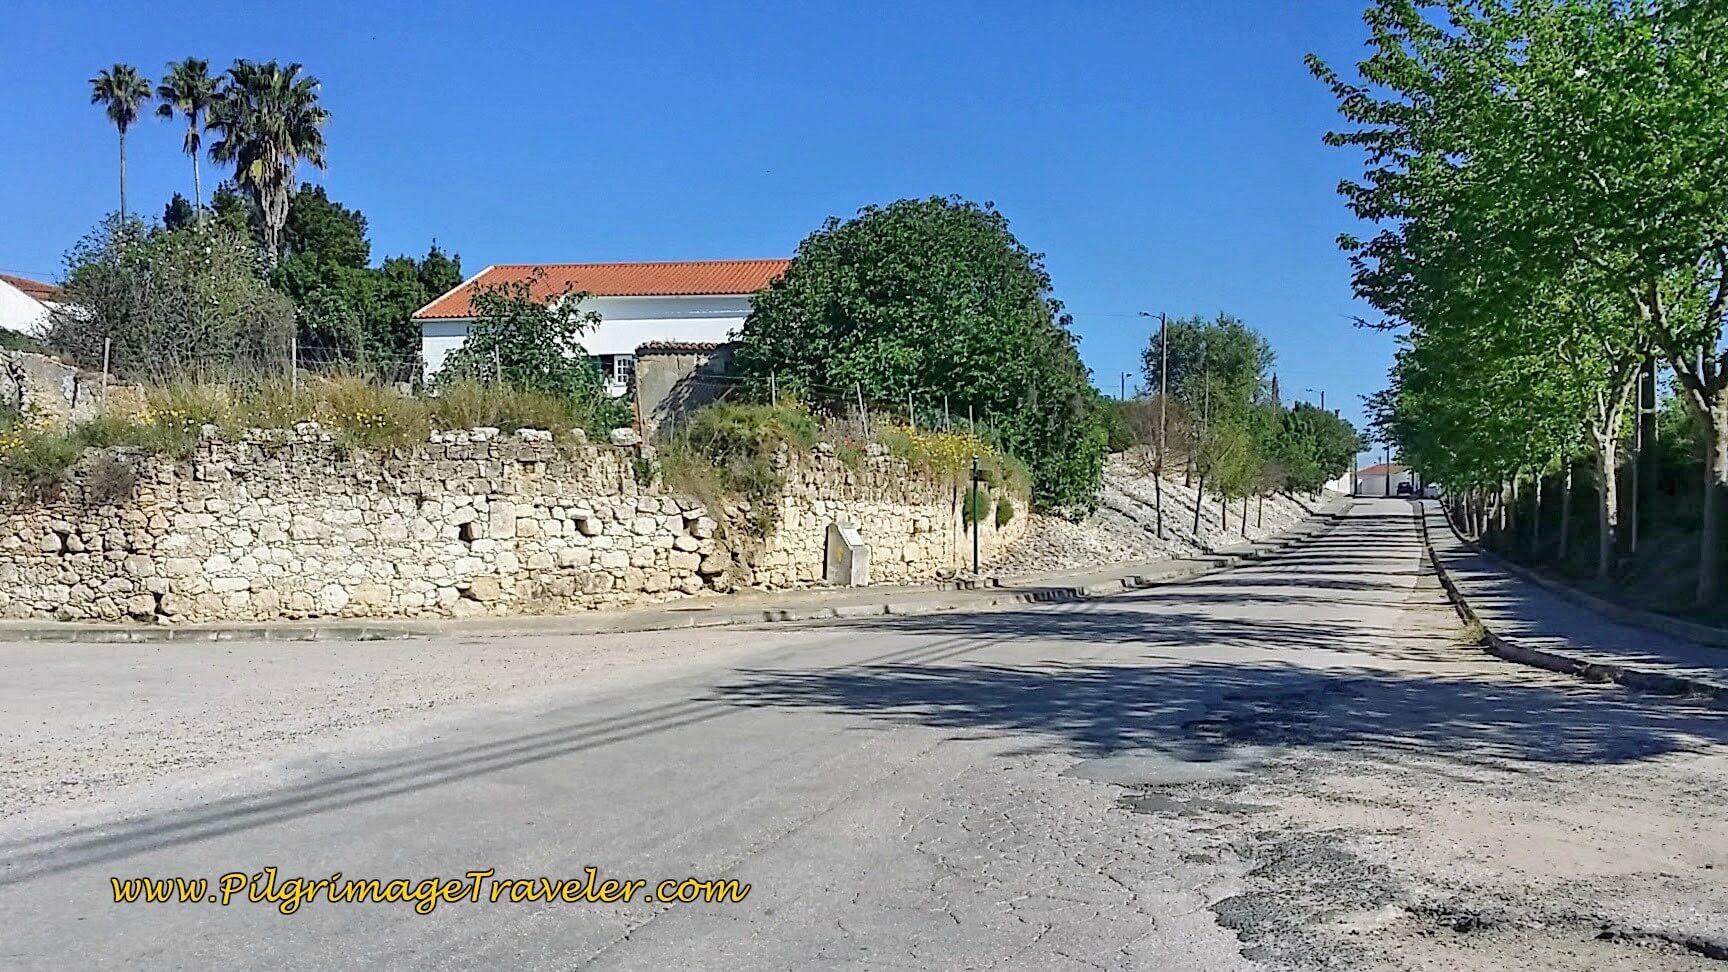 Vale de Figueira, Portugal on the Camino de Santiago